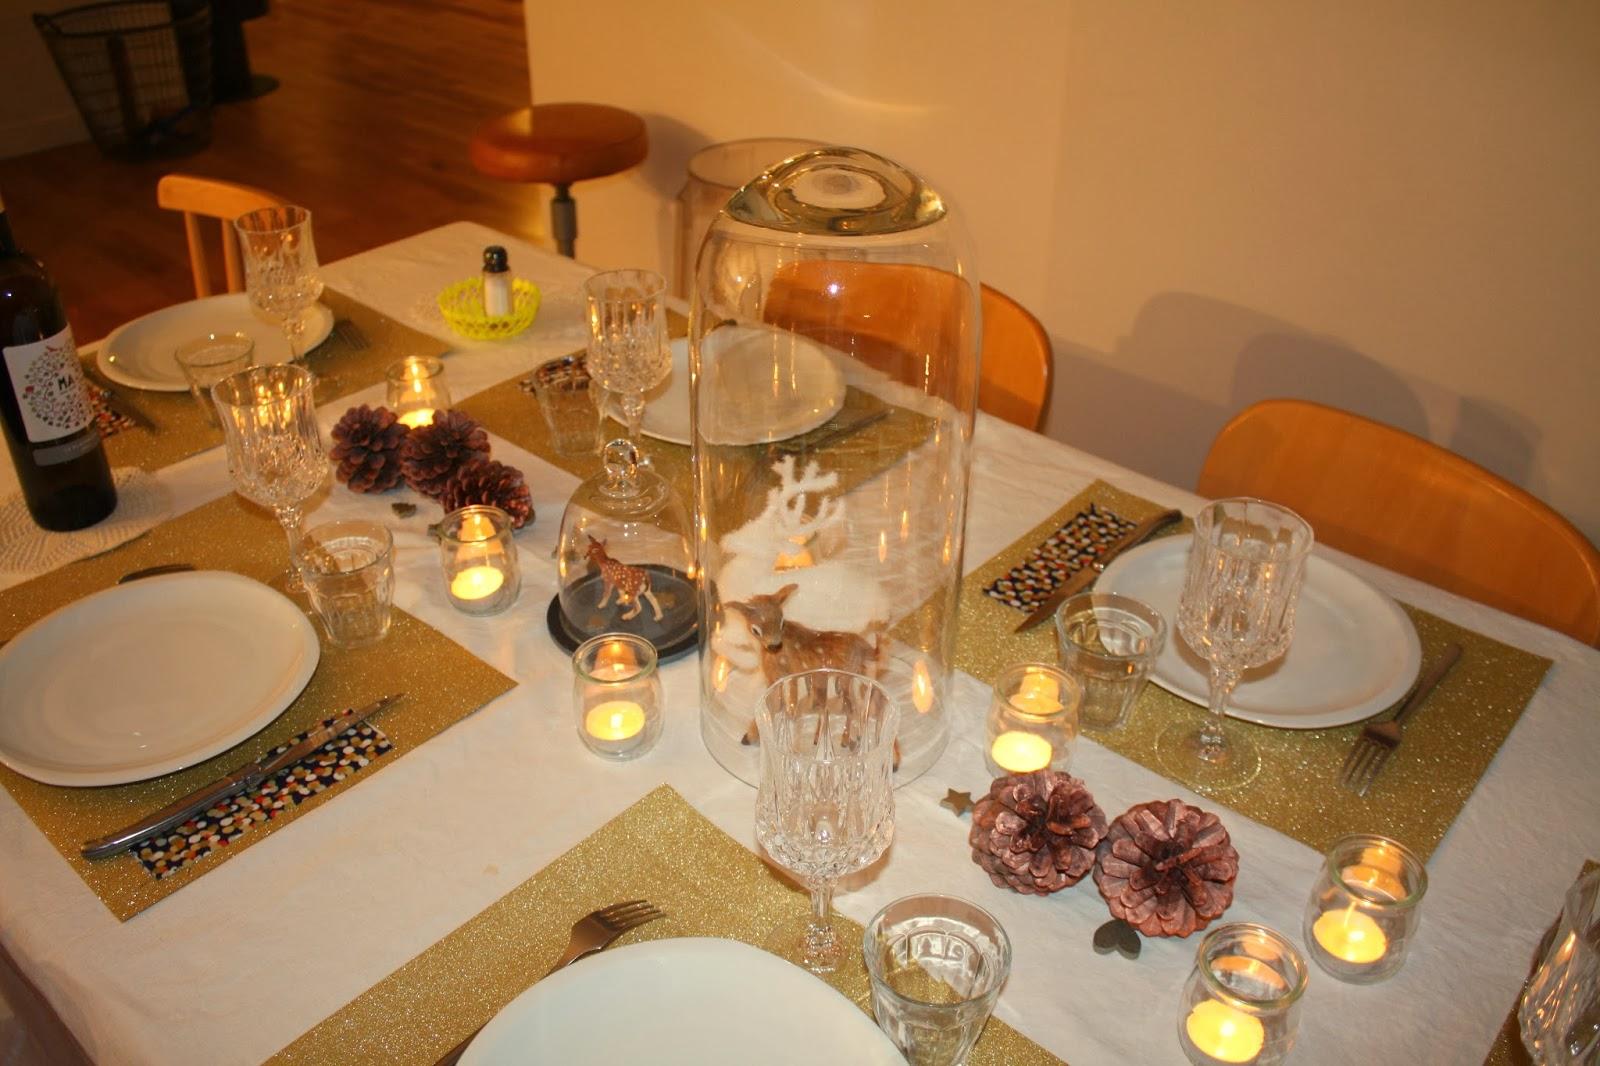 Caro inspiration novembre 2013 for Set de table dore